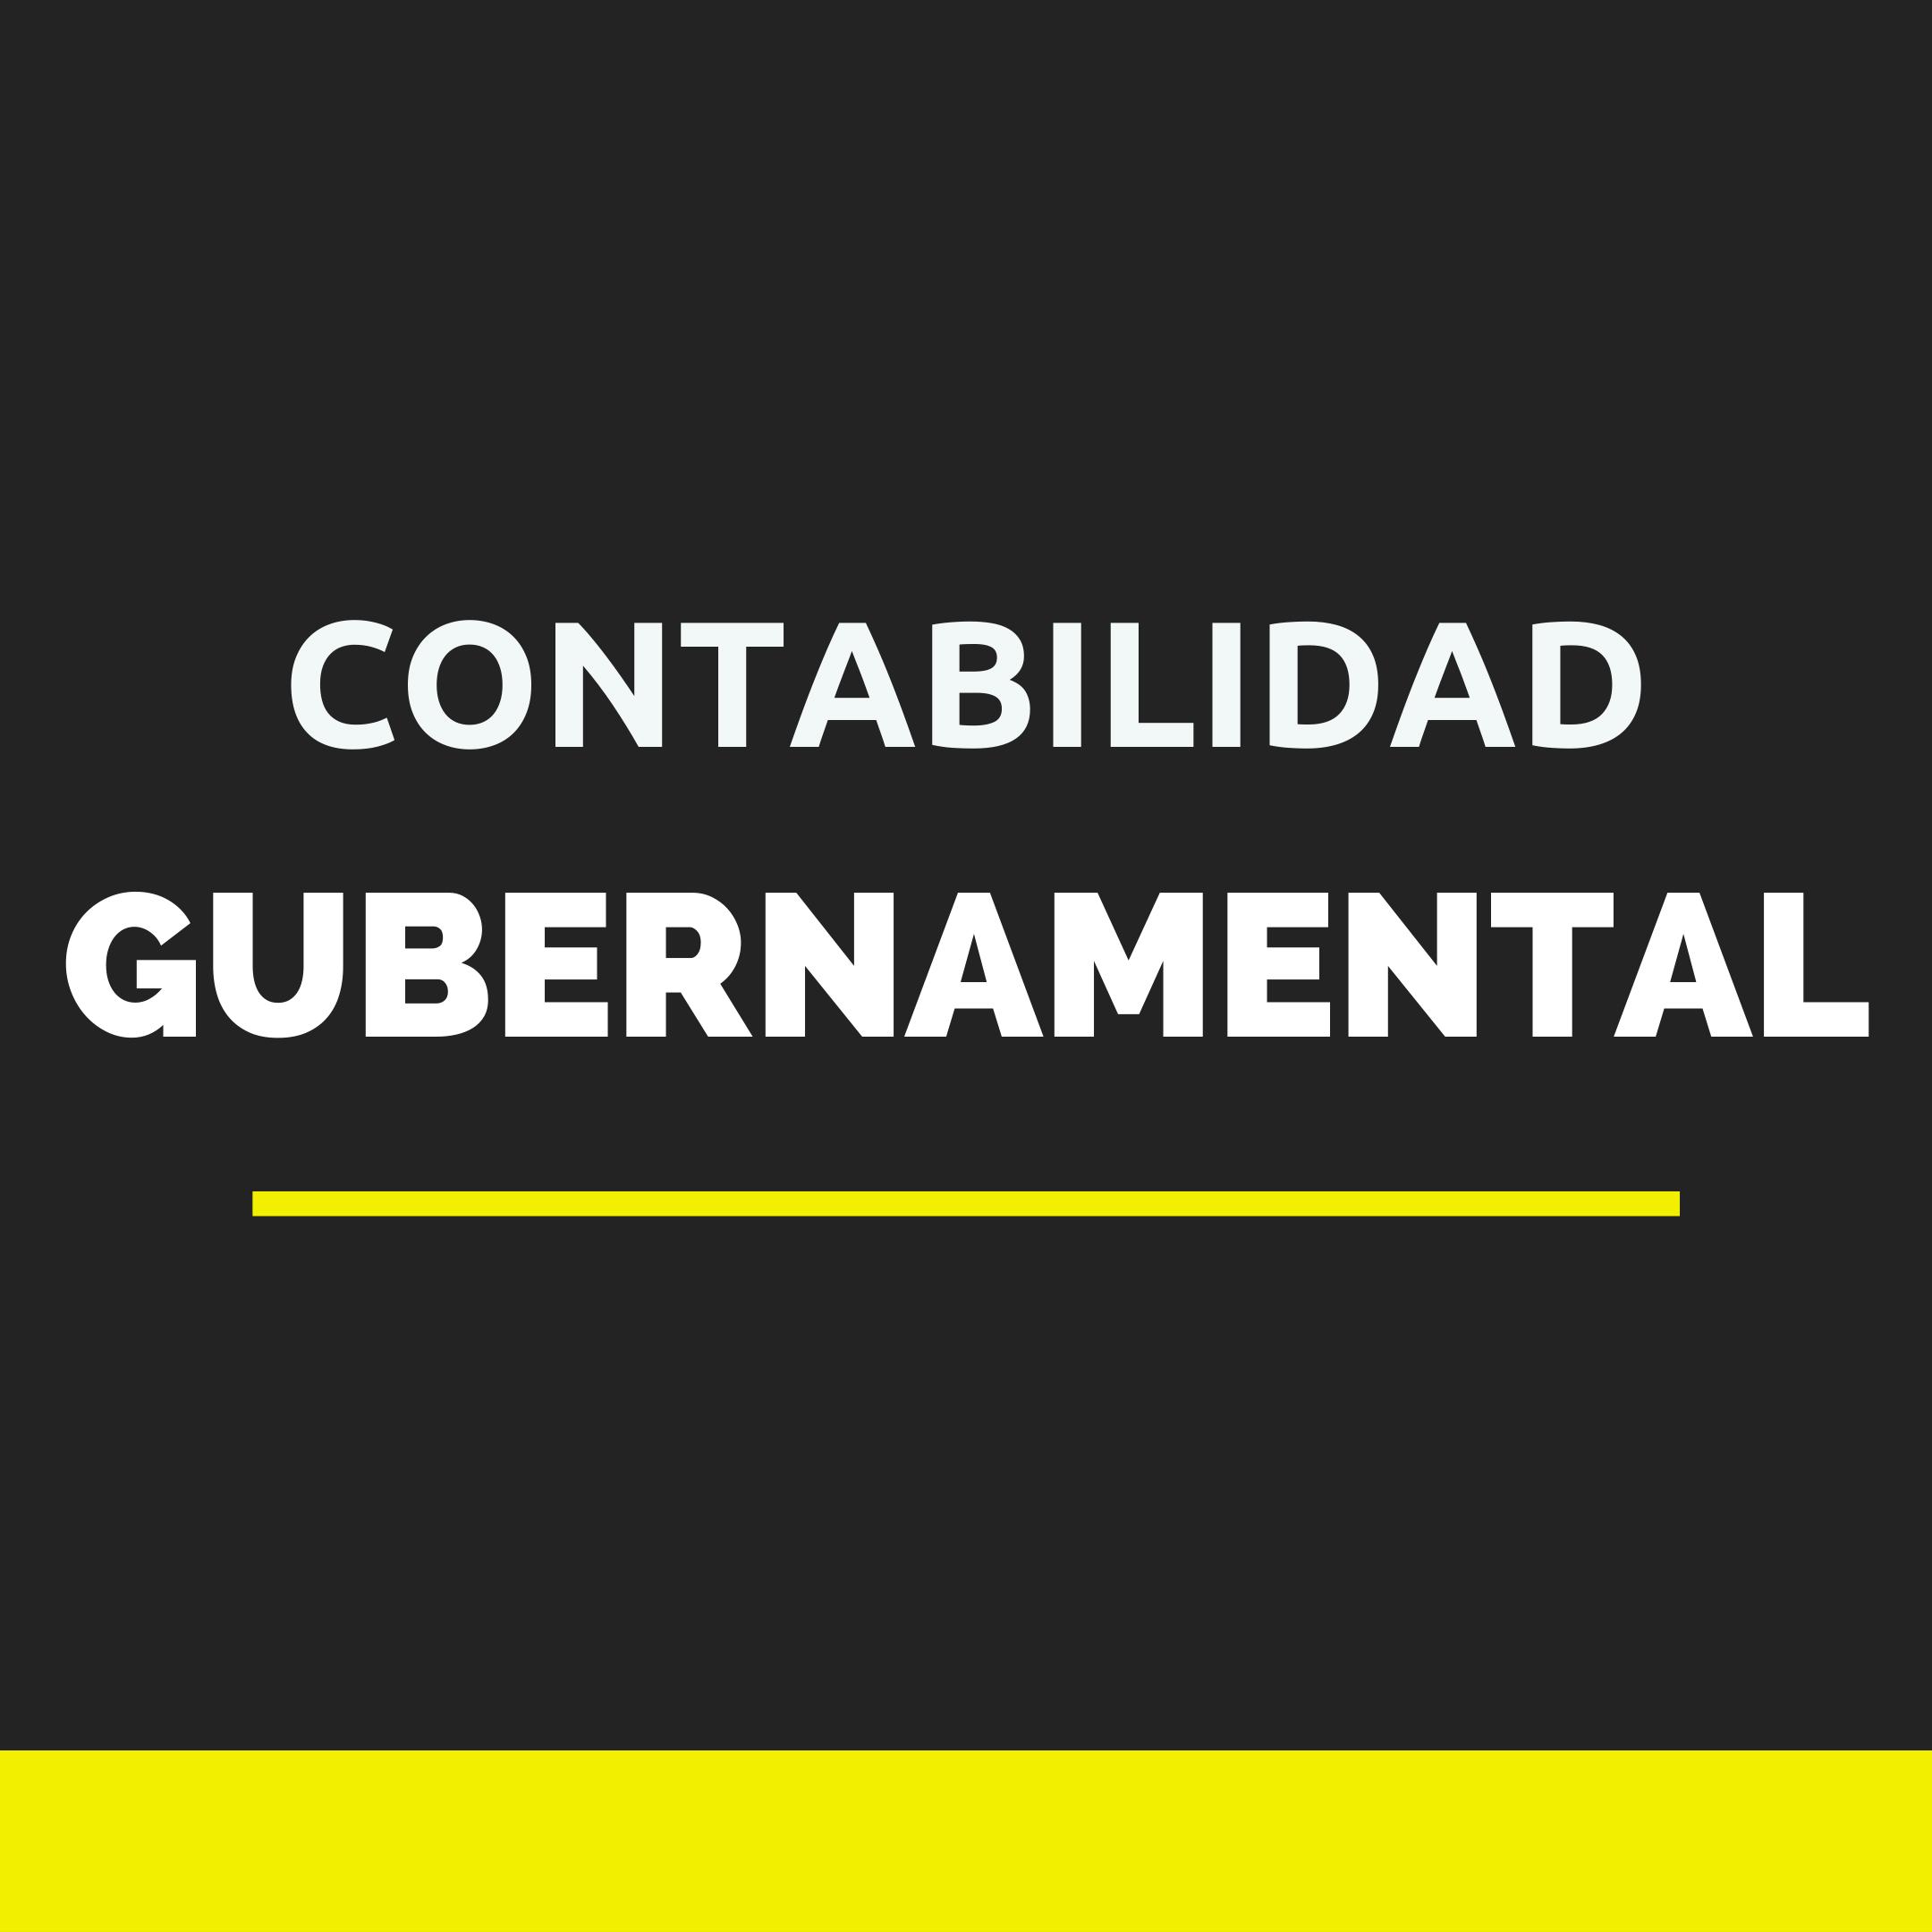 CONT. GUBERNAMENTAL